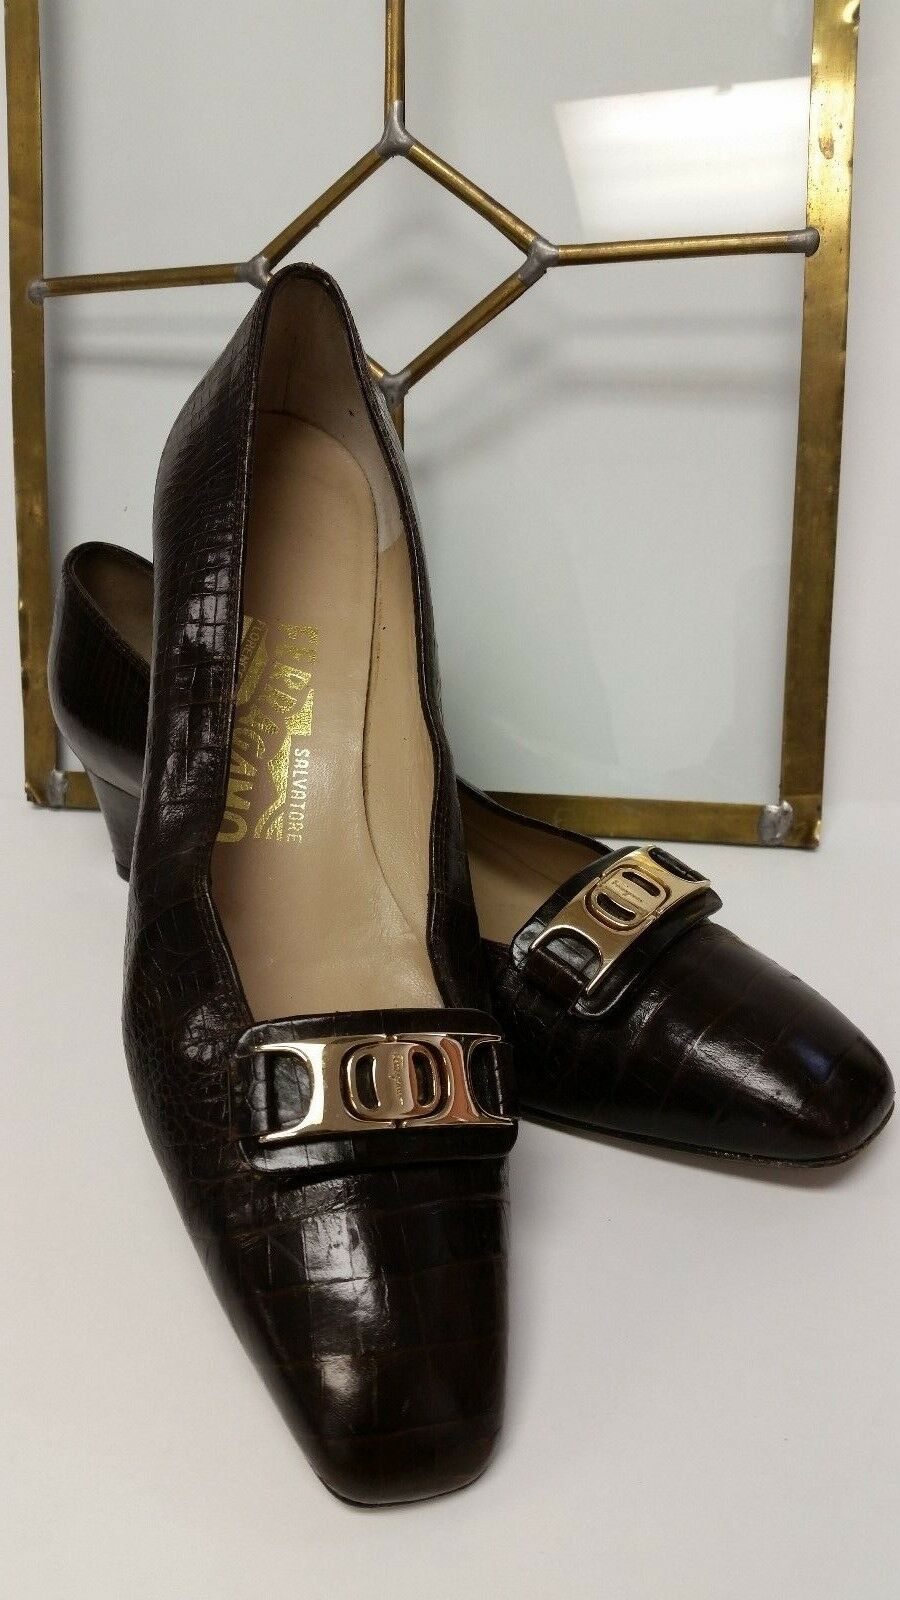 SALVATORE FERRAGAMO Boutique Gancini gold Buckle Brown Croc Leather shoes 7.5 AA